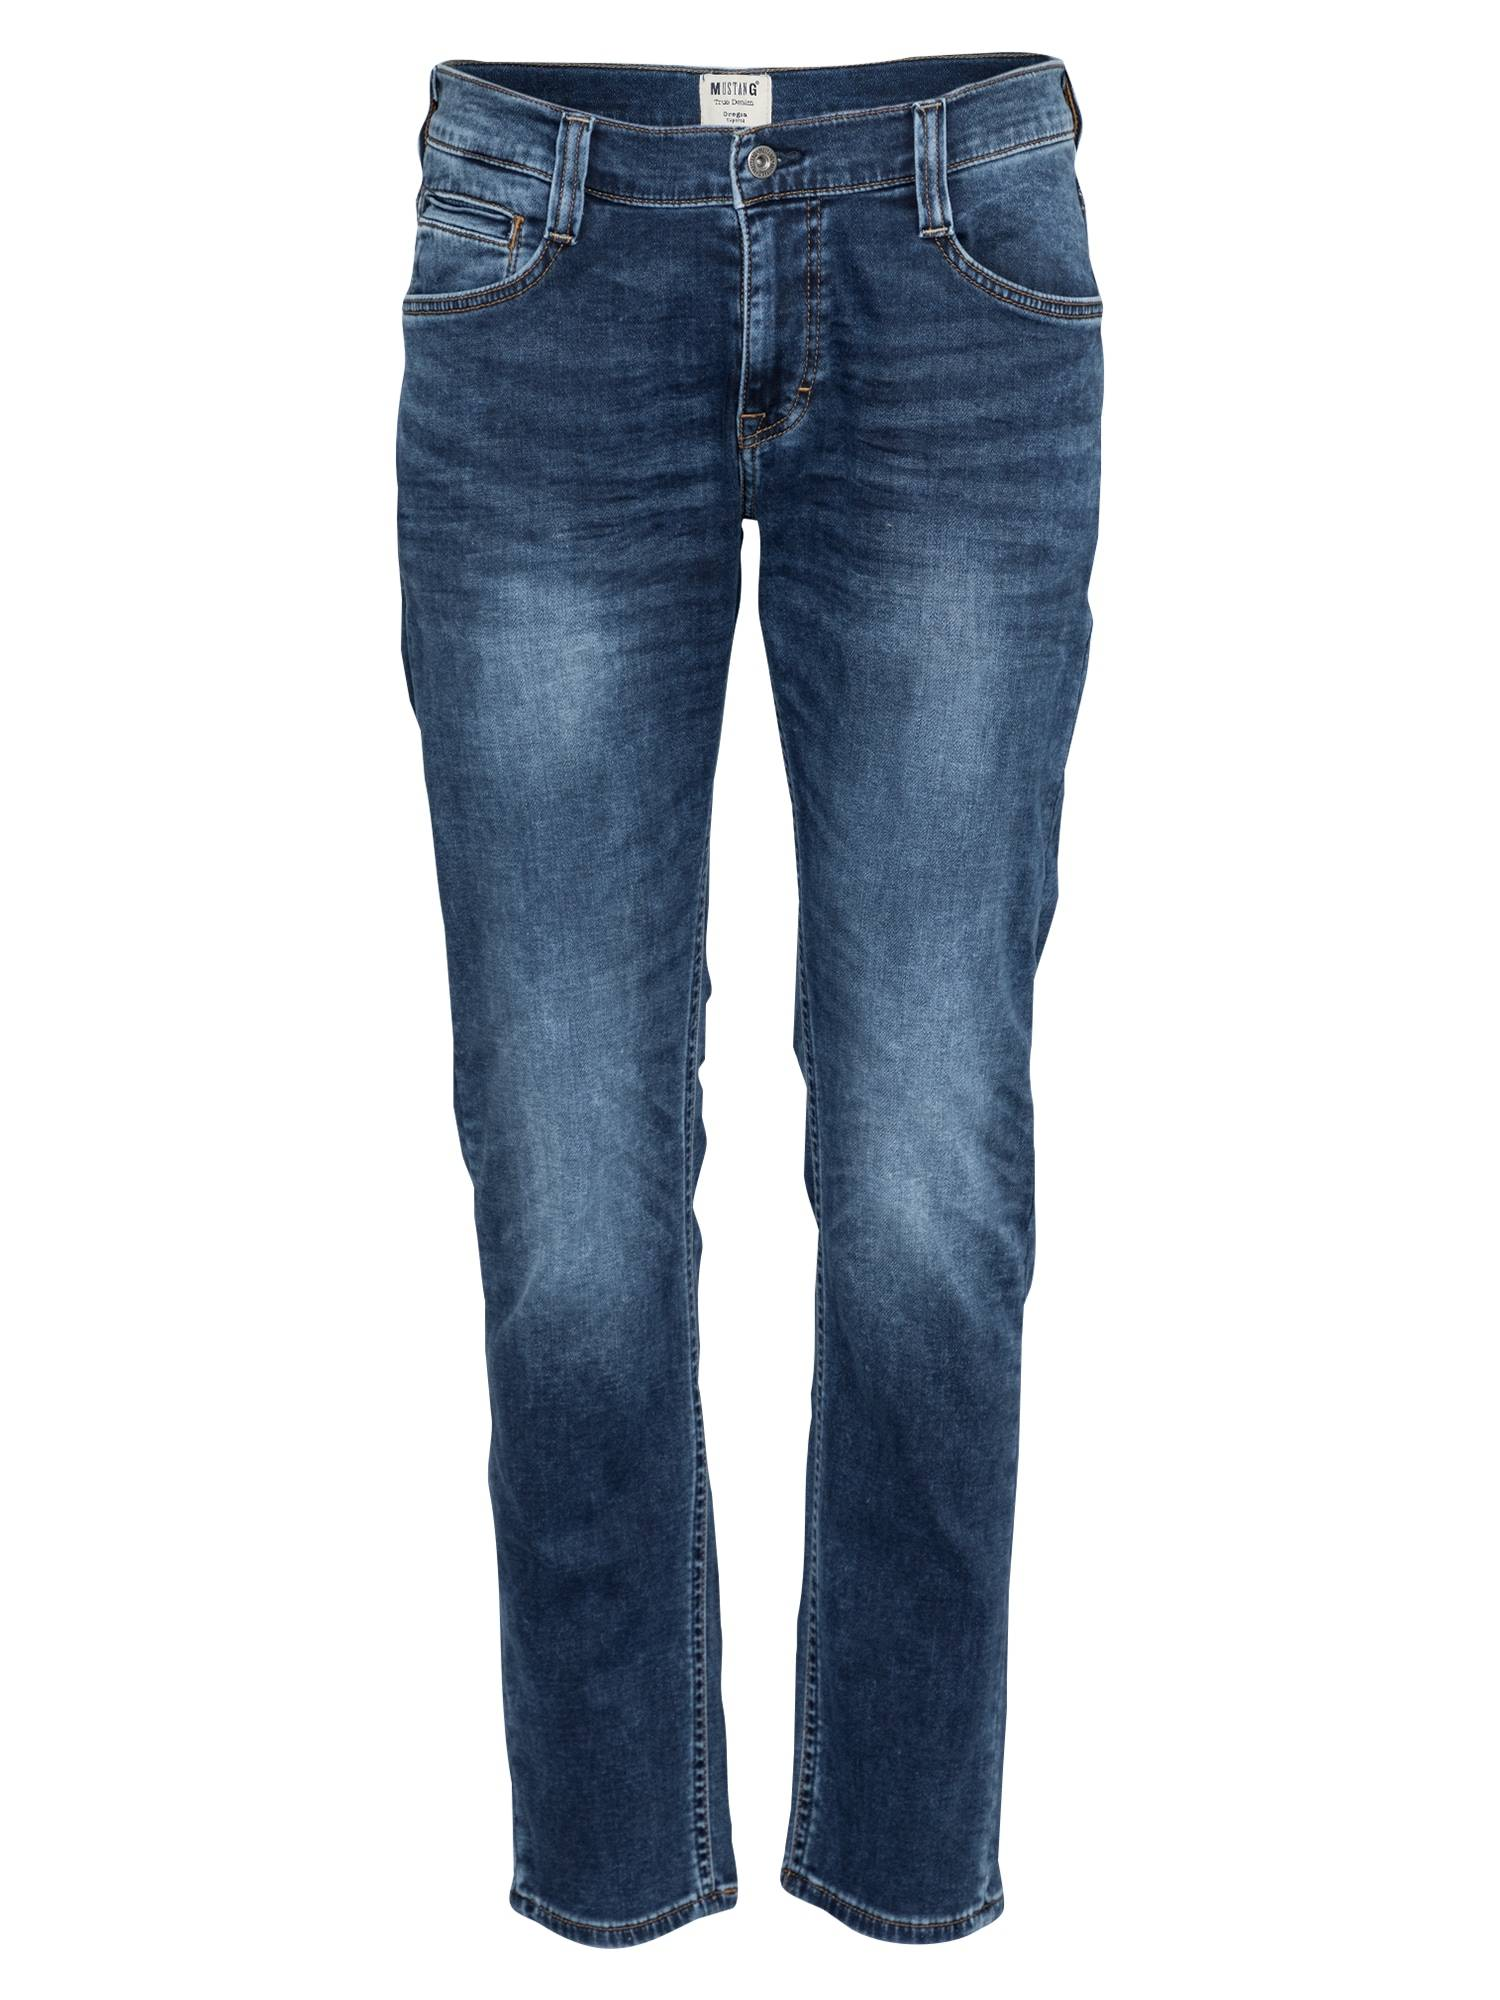 MUSTANG Jean 'Oregon'  - Bleu - Taille: 35 - male